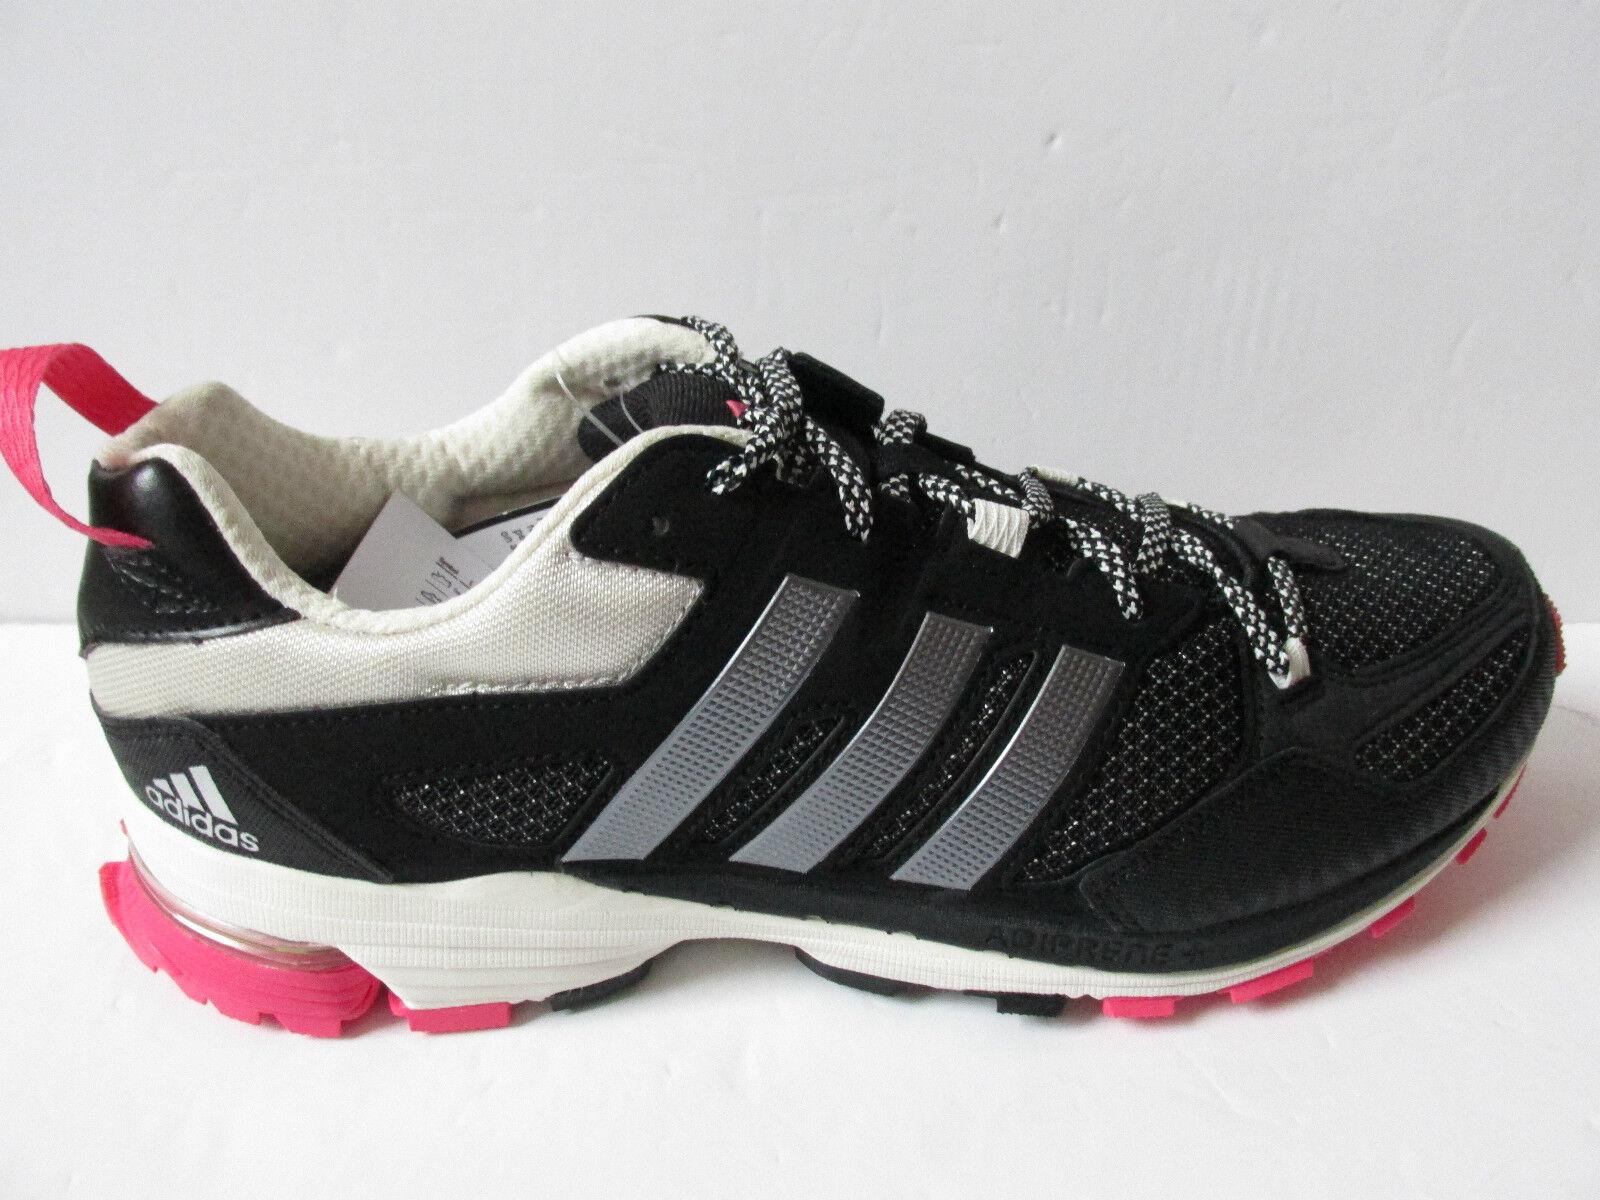 Adidas Supernova Zapatillas Riot 5 con Mujer Zapatillas Supernova Running D66641 Zapatillas 58d017